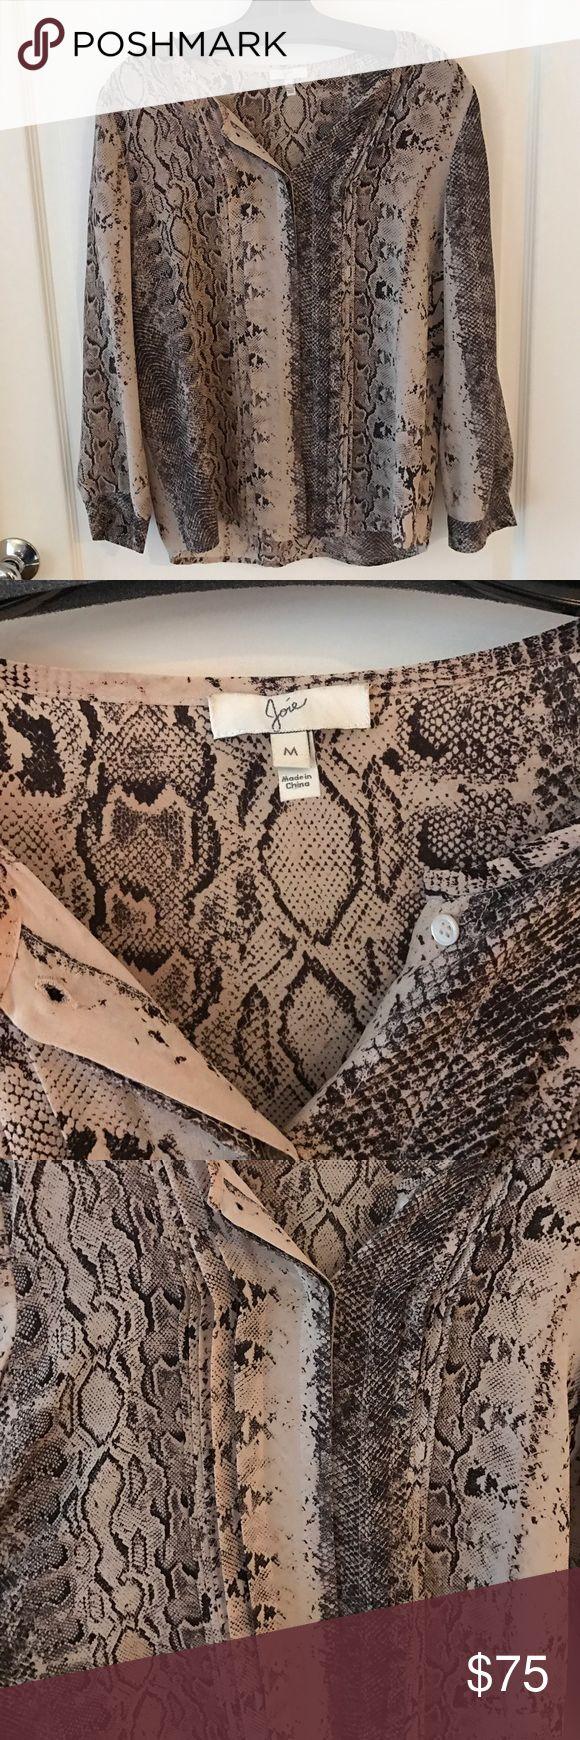 Joie silk snakeskin / animal print blouse SIZE M Joie long sleeve button up silk snakeskin / animal print blouse  SIZE Medium. Joie Tops Blouses